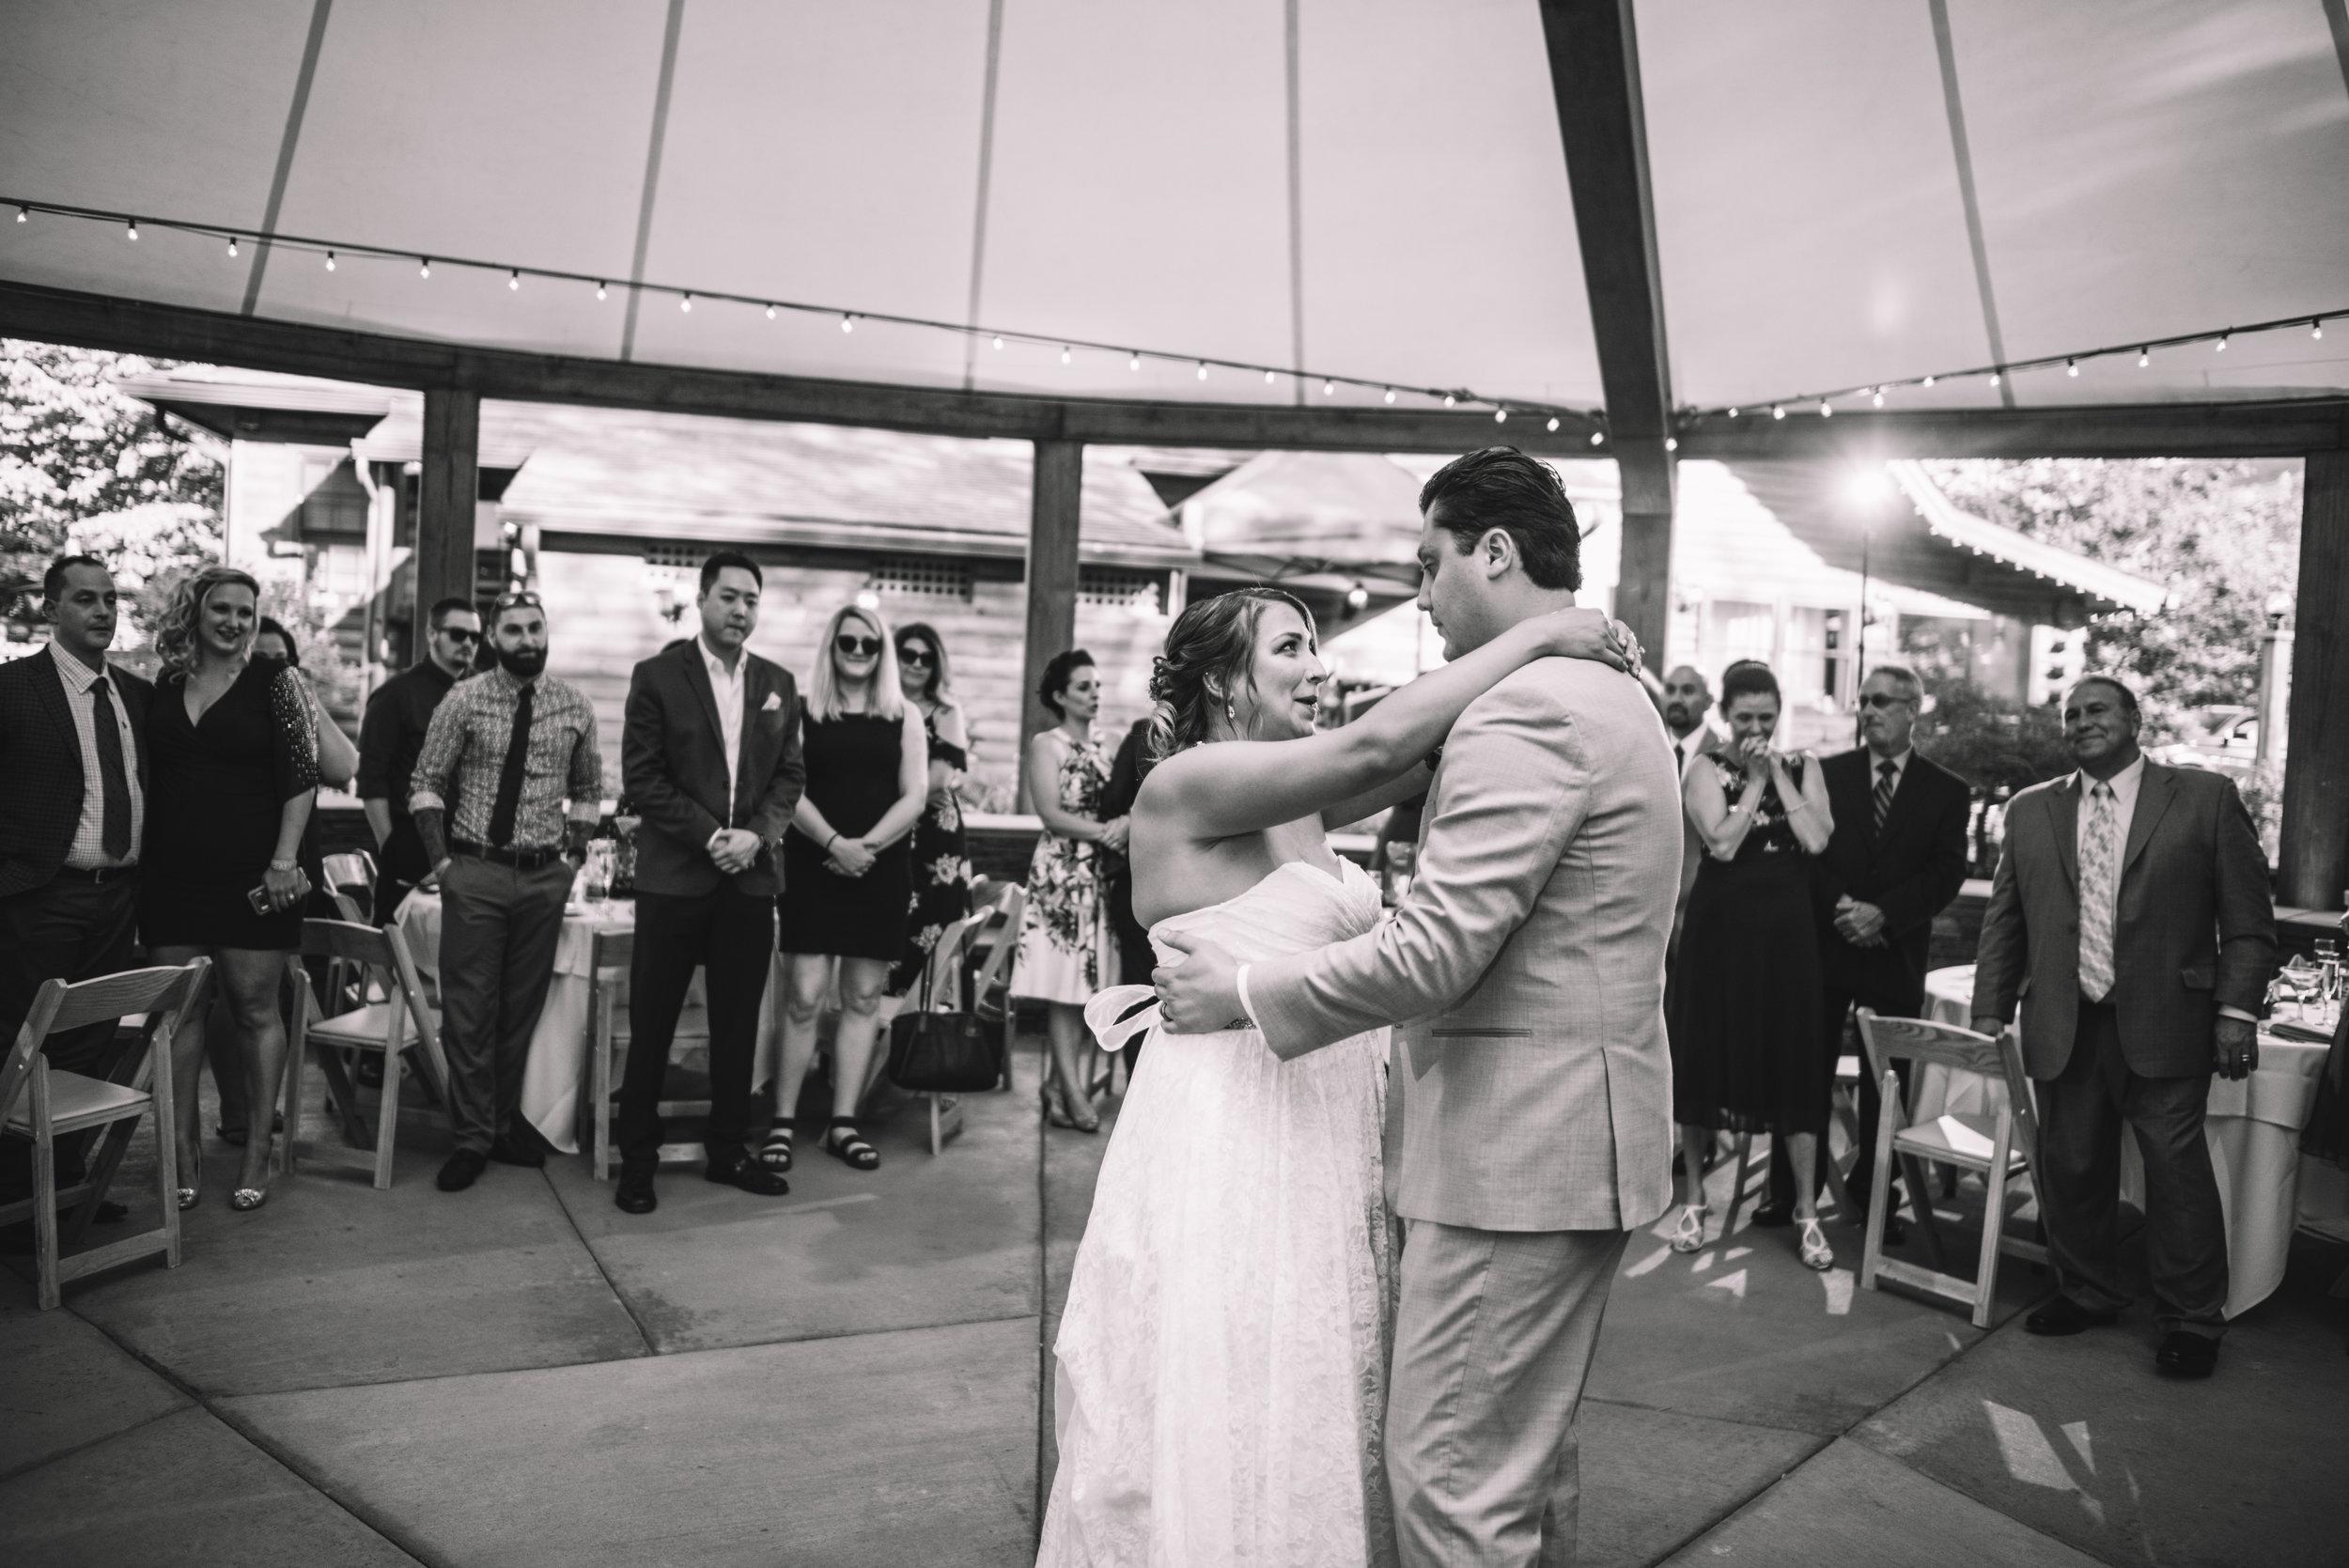 WeddingPhotos | NJPhotographer | Highlights-6-8.jpg